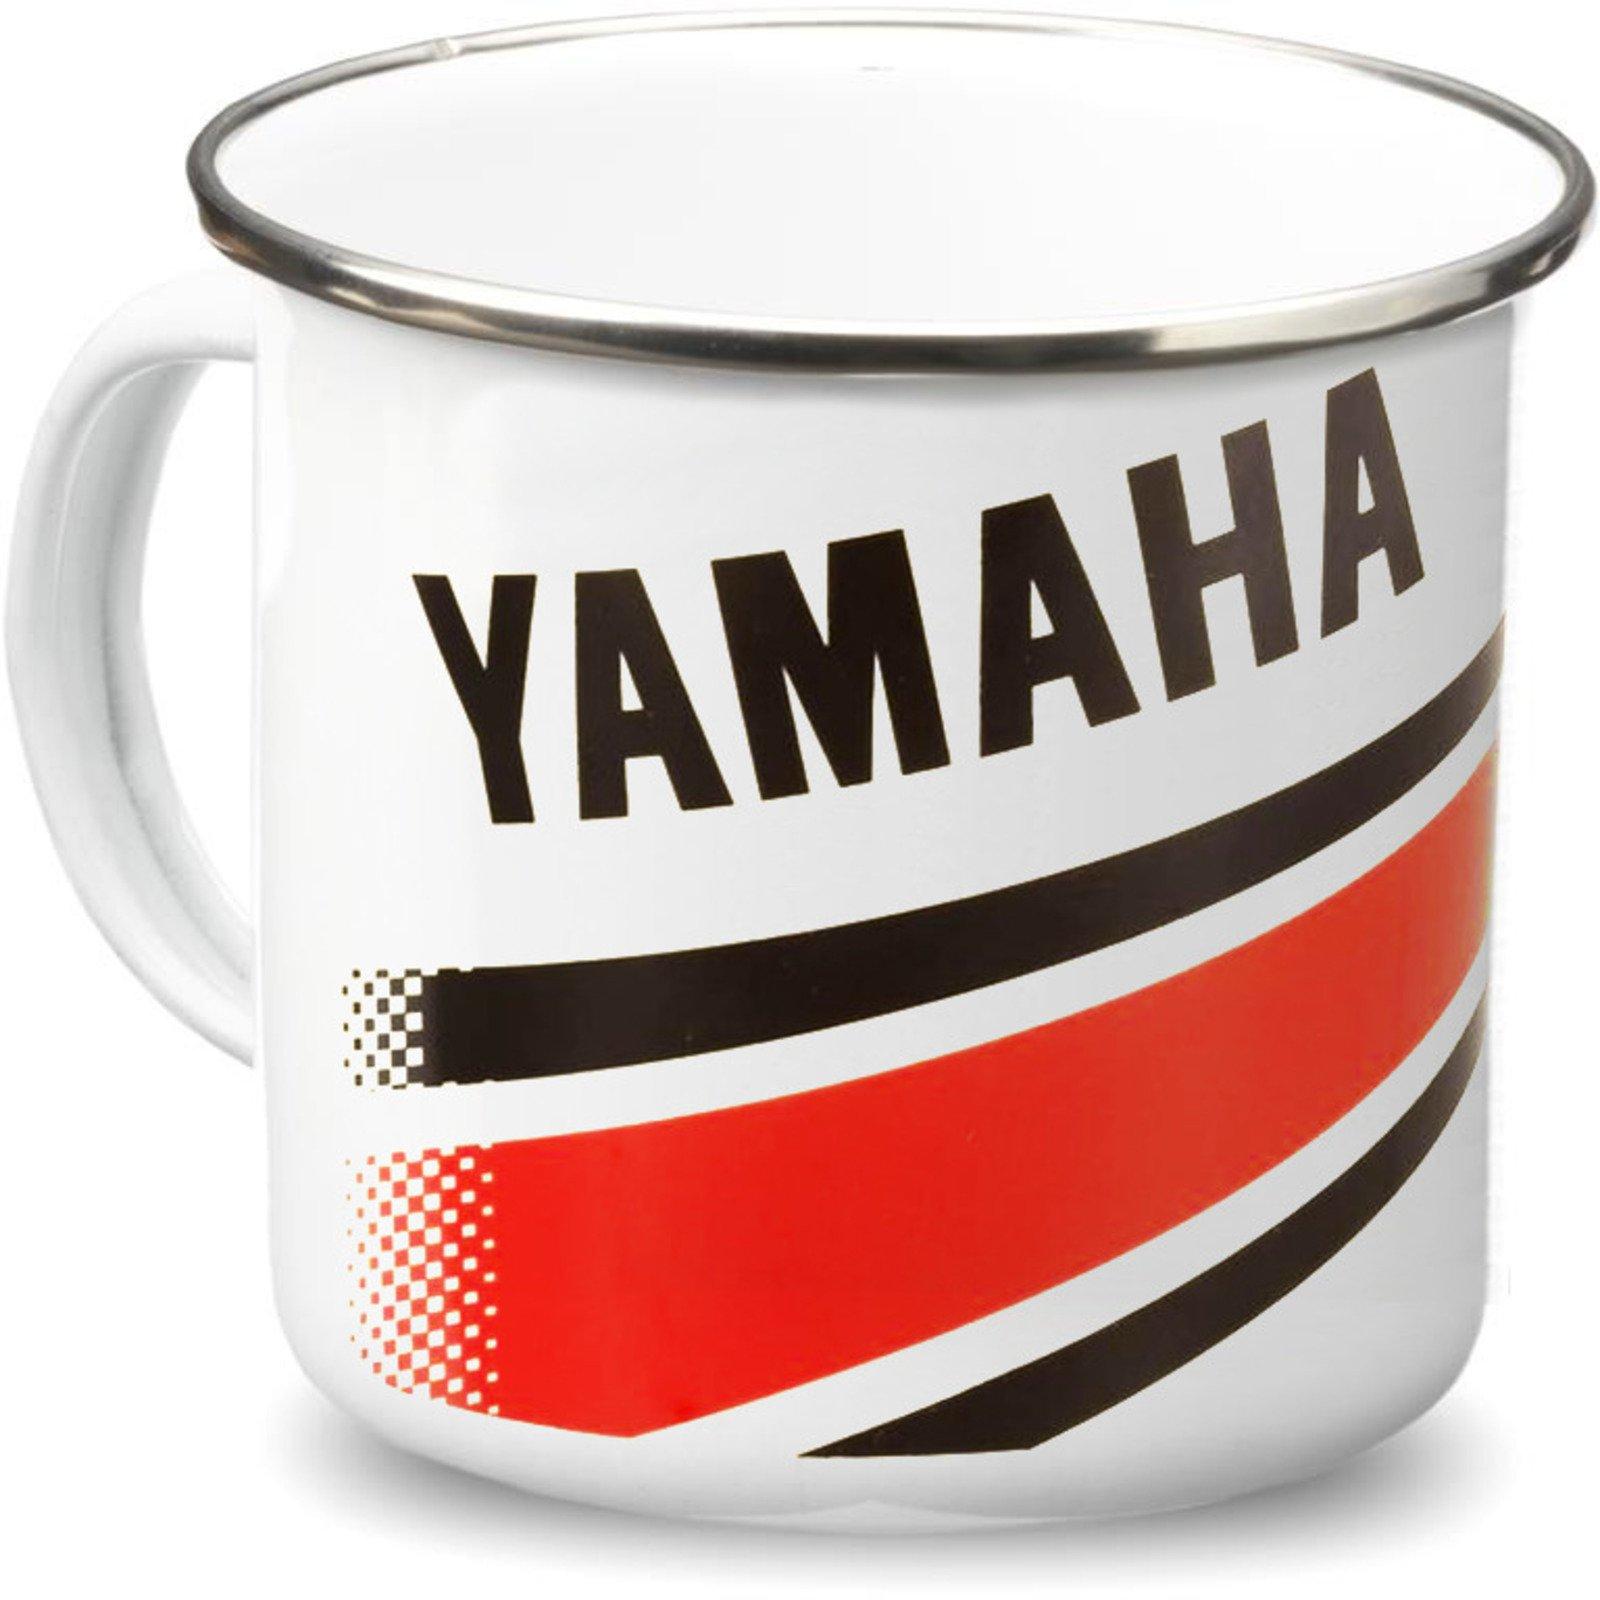 Yamaha Enamel Tin Mug 'Revs your Heart' 250ml  40661